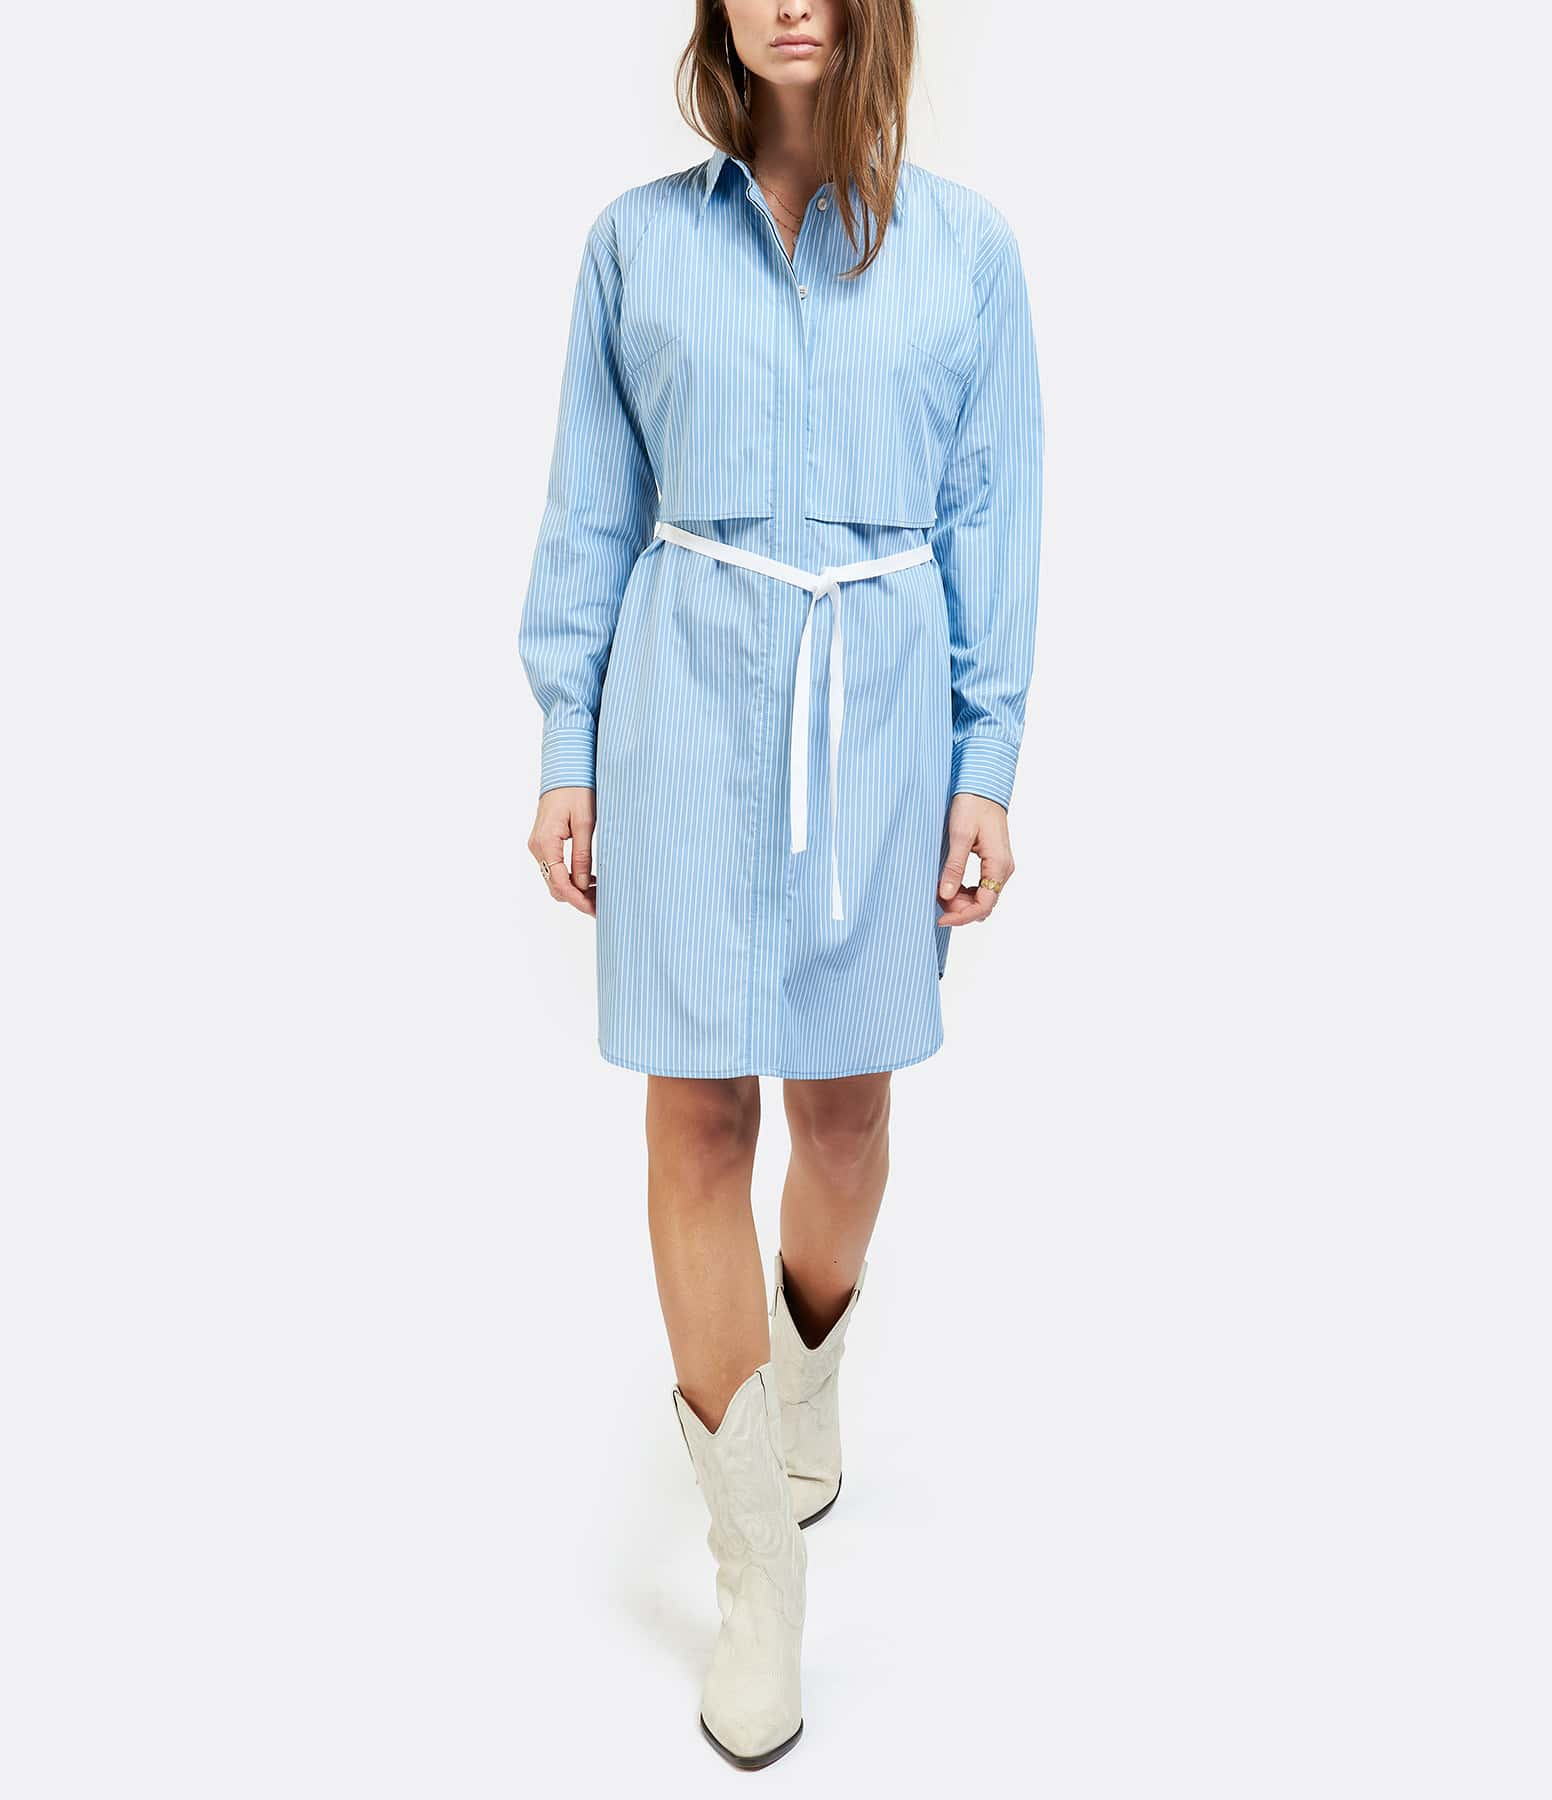 MM6 MAISON MARGIELA - Robe Chemise Popeline Coton Blanc Bleu